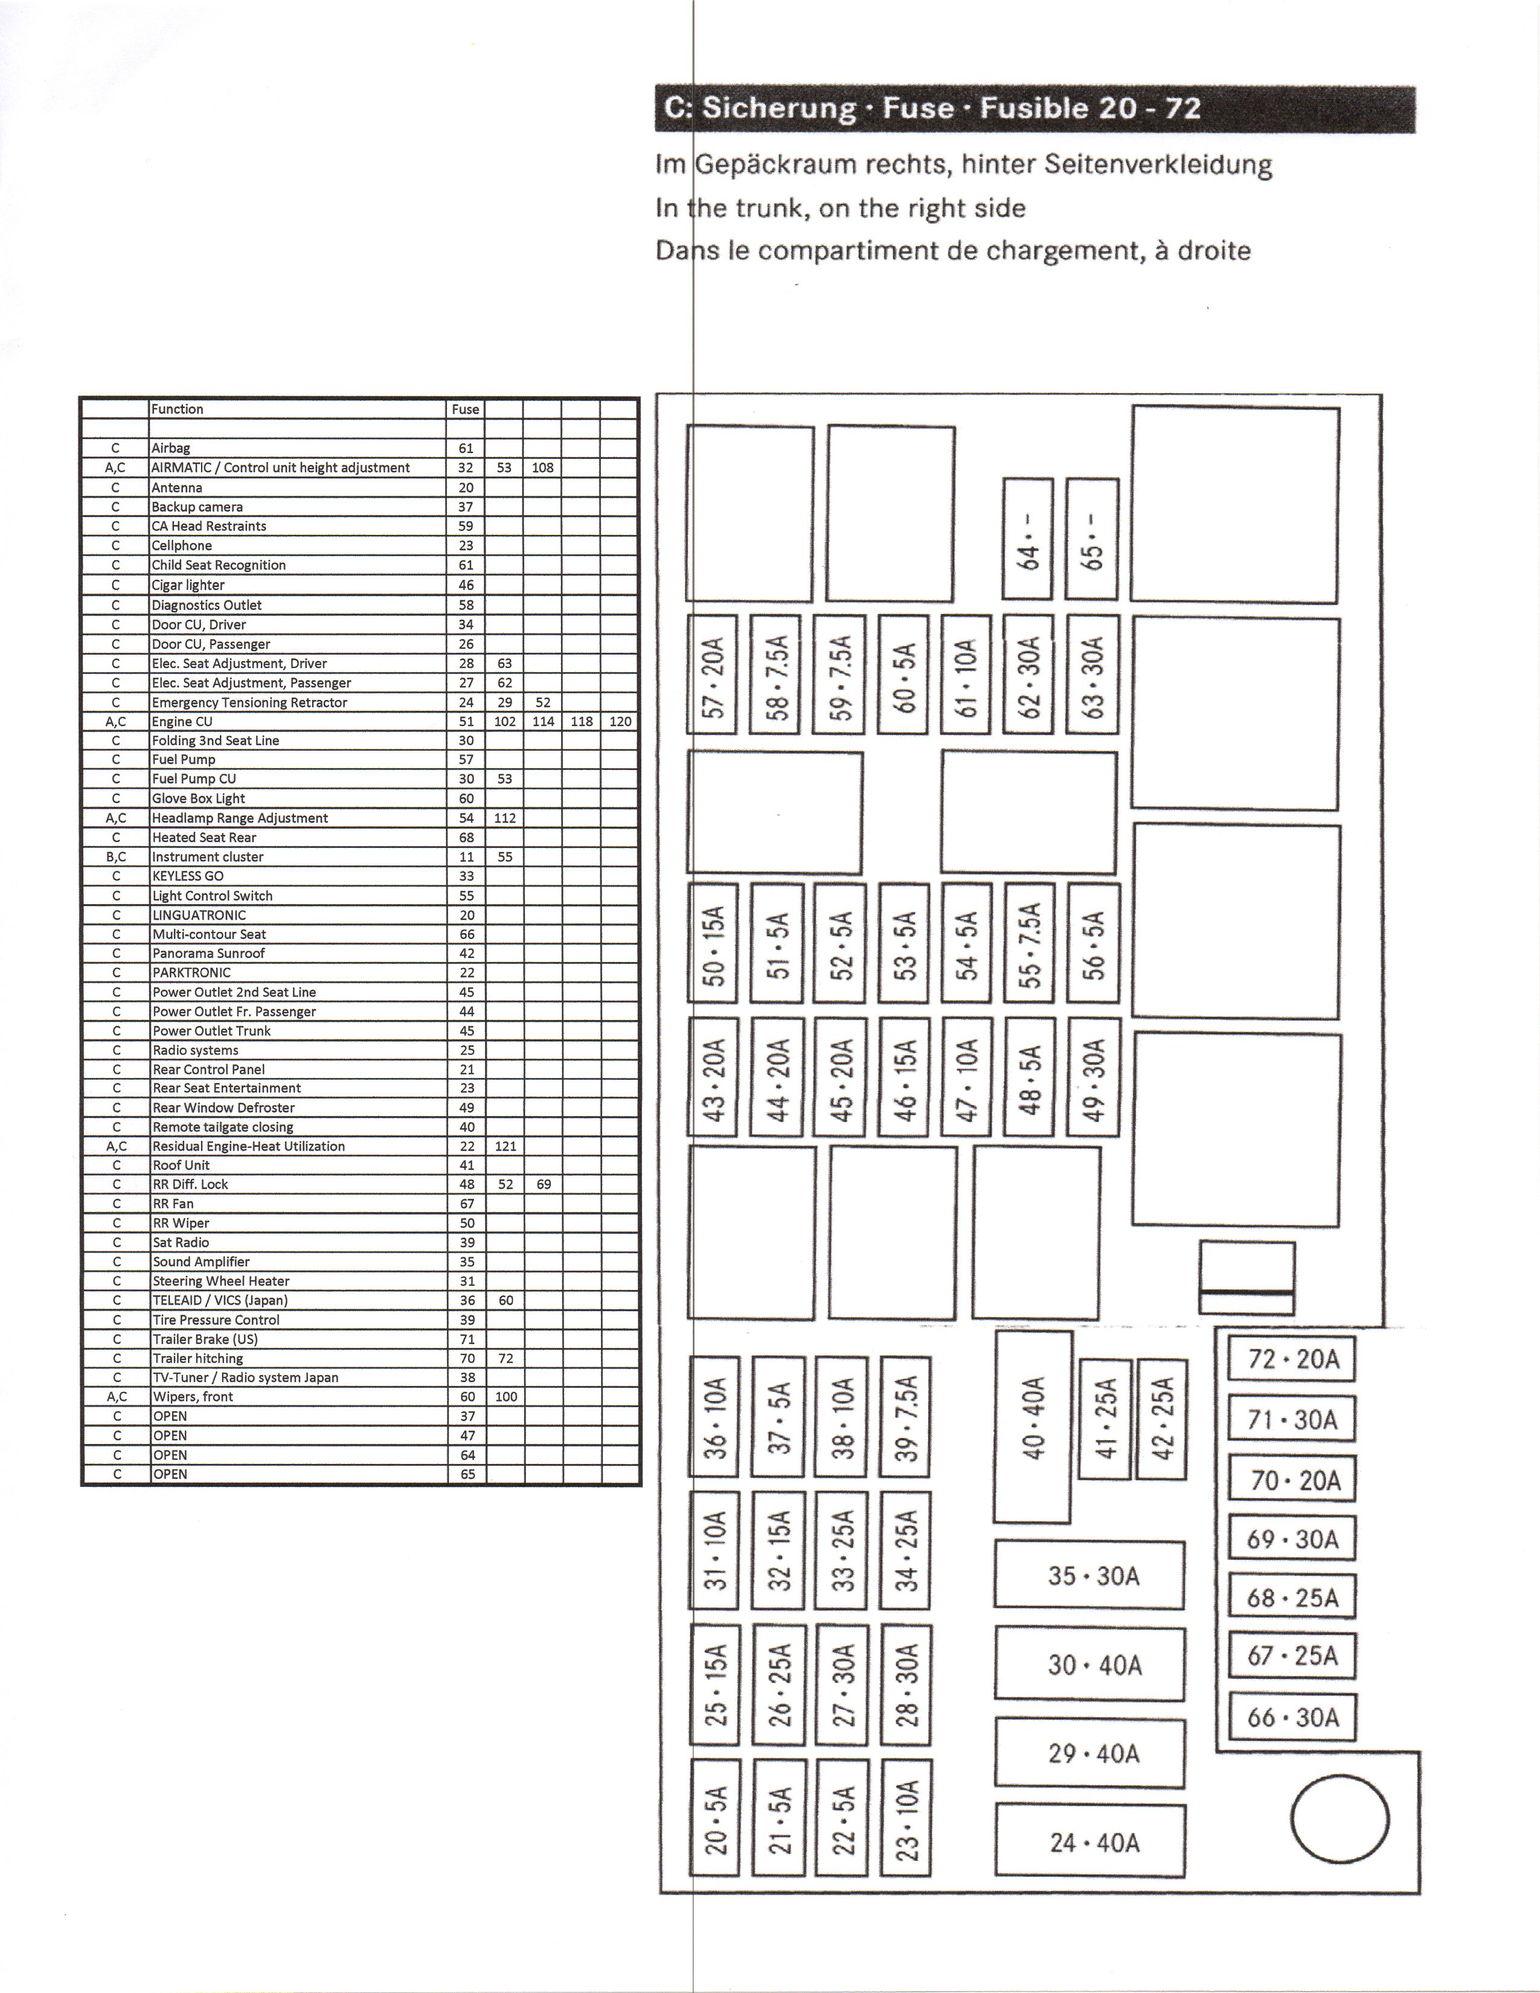 gl320 fuse box diagram 2006 2007 mercedes benz gl450 rear 2007 mercedes r350 fuse box diagram gl fuse chart 2007 2012 diagram, chart